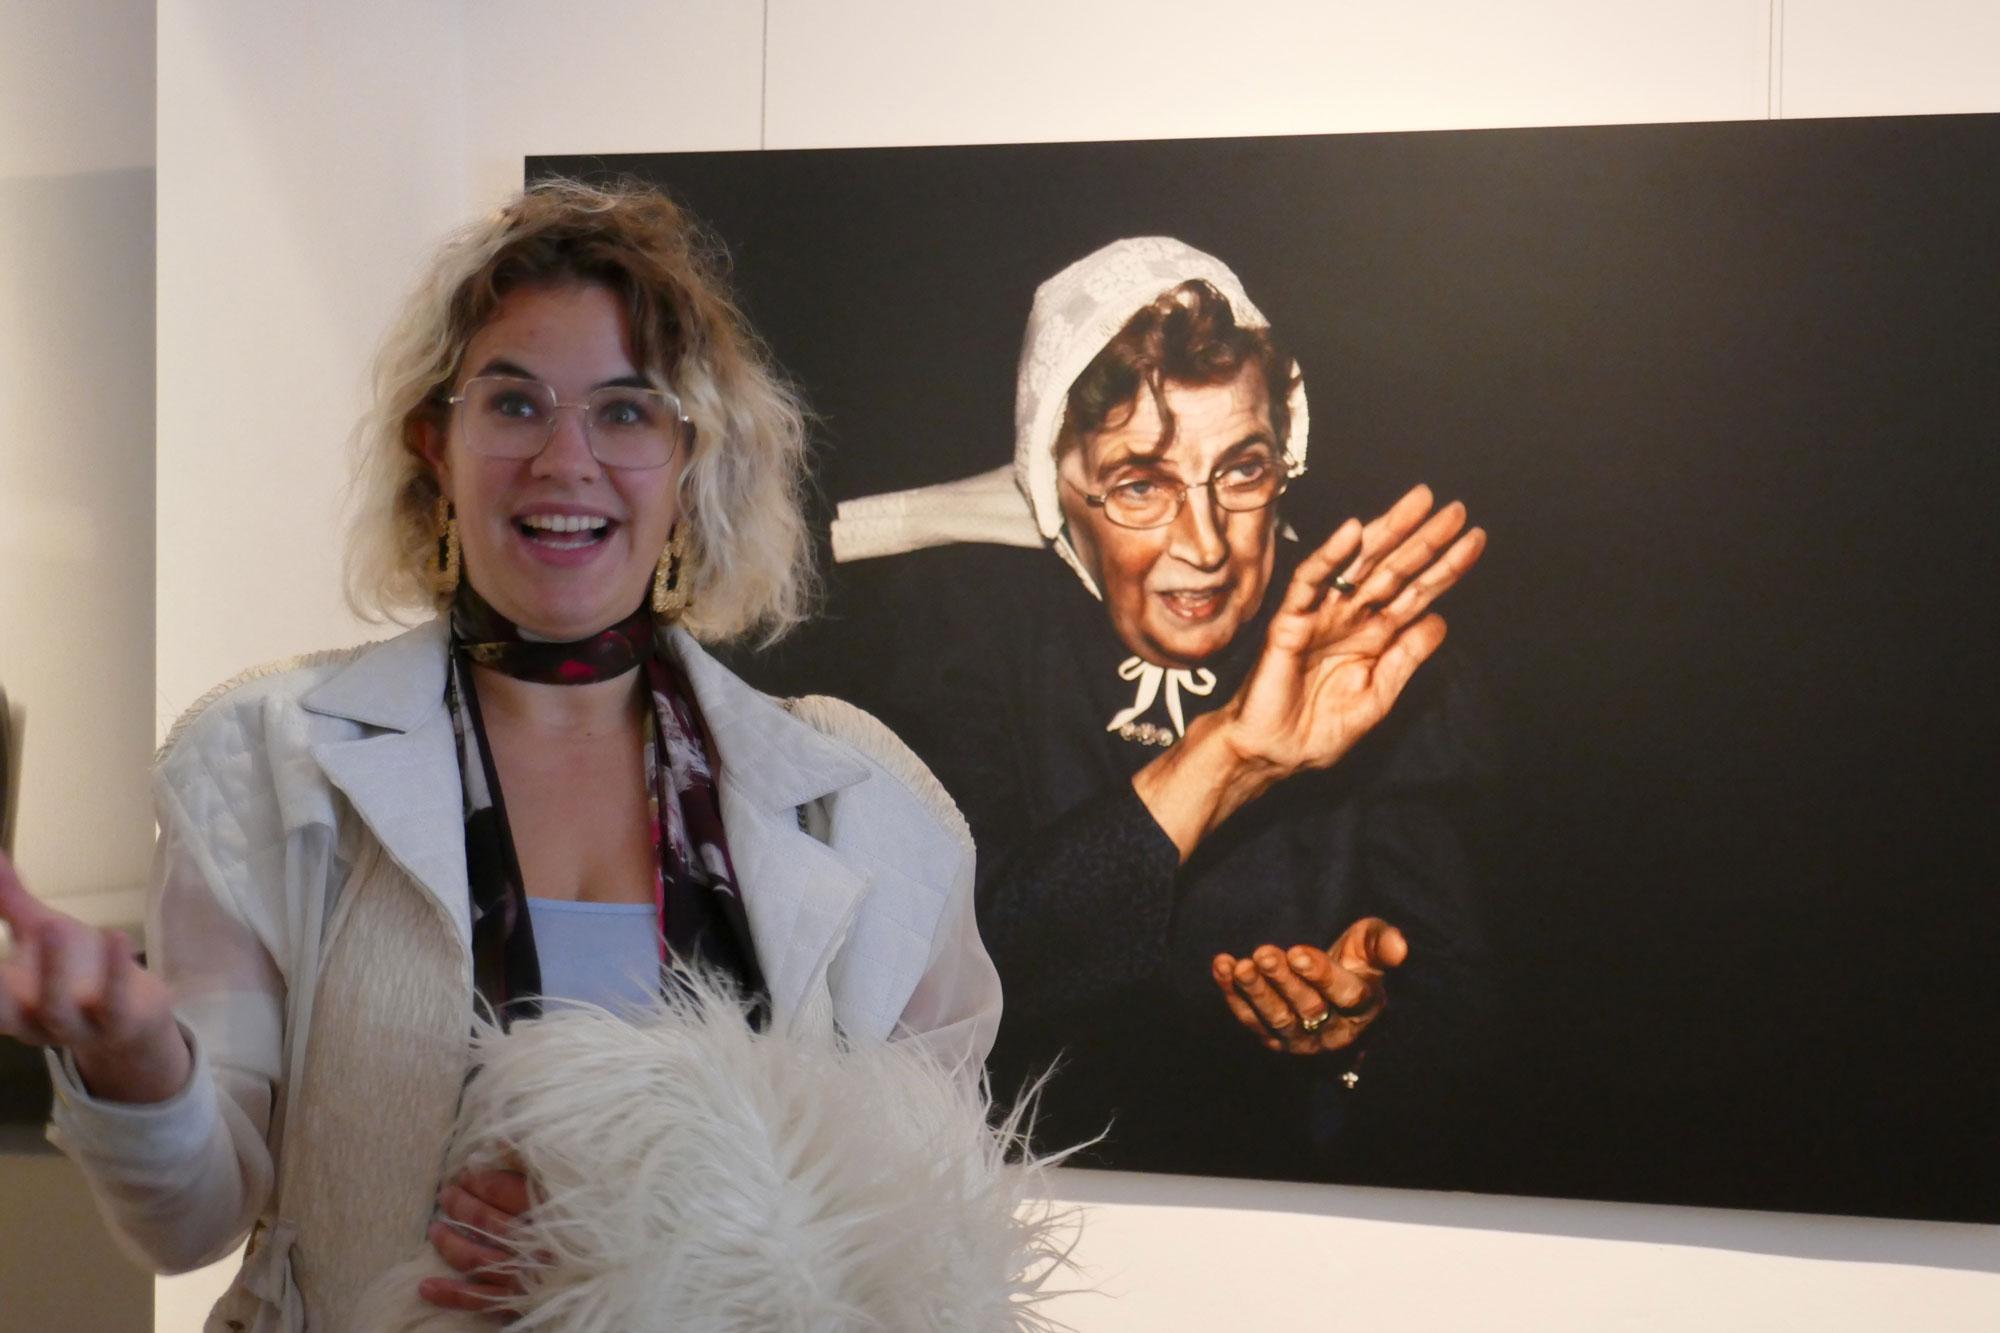 Künstlerin Louise te Poele vor Stien, 2009, Fotografie auf Aluminium. (Foto: Kreis Unna)